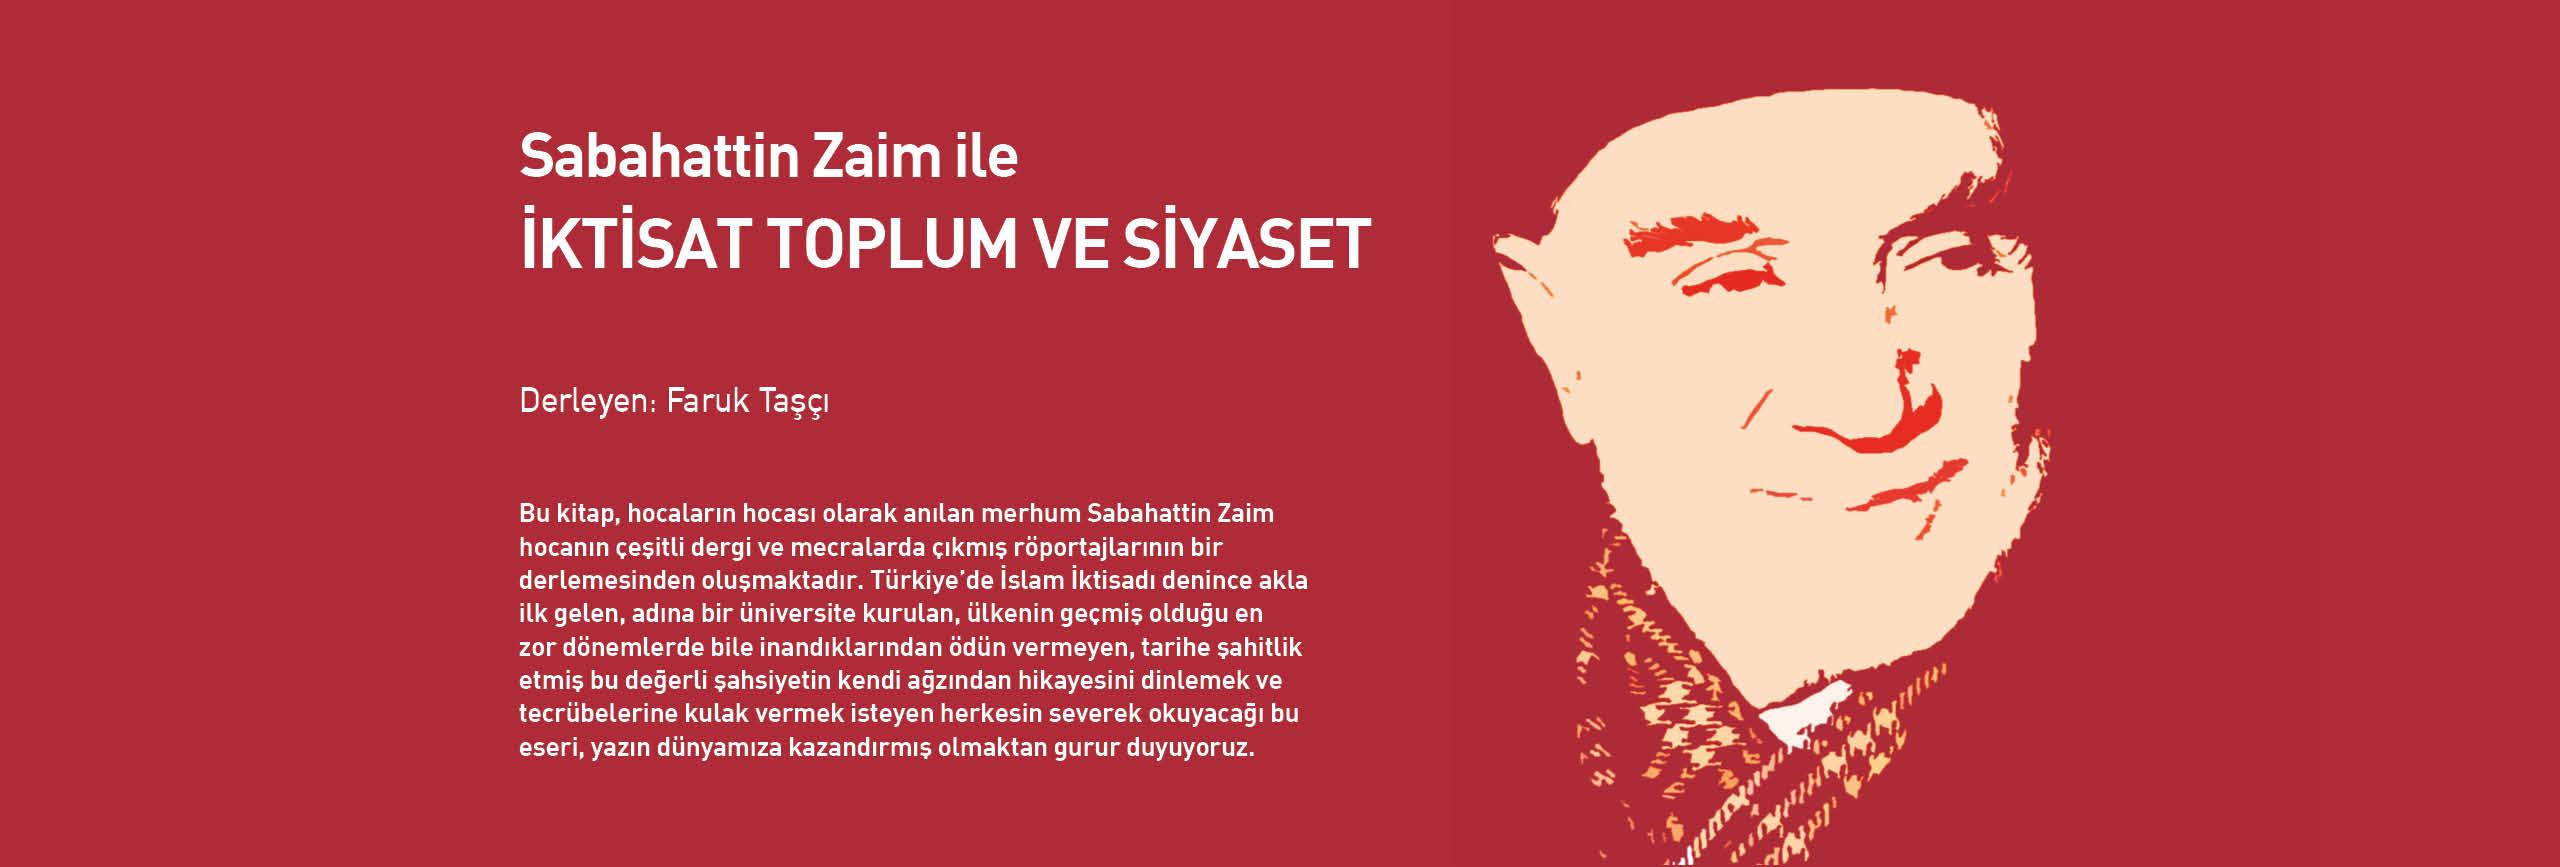 http://iktisatyayinlari.com/content/1-home/1.jpg